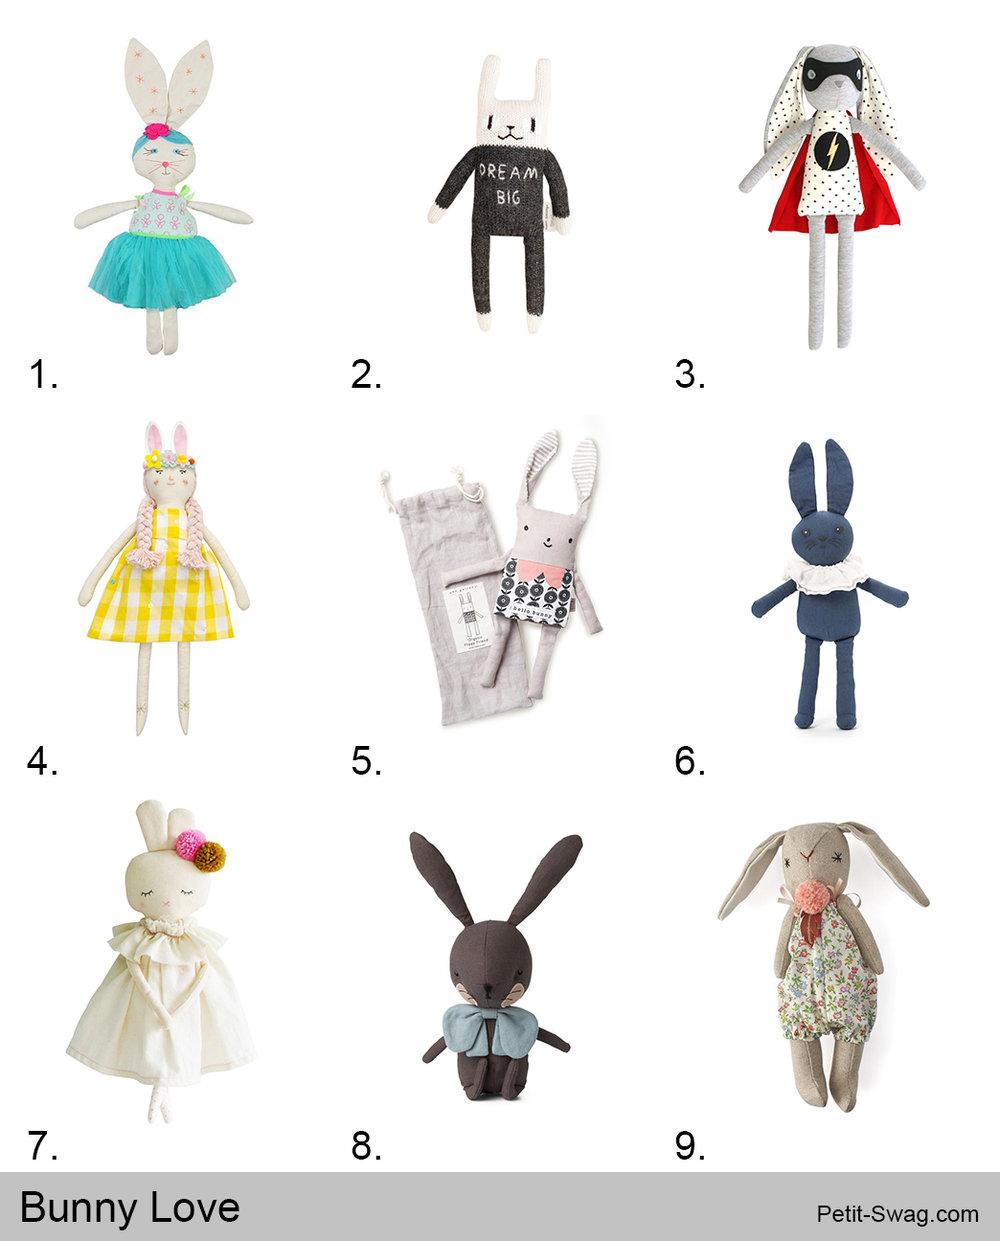 Bunny Love | petit-swag.com